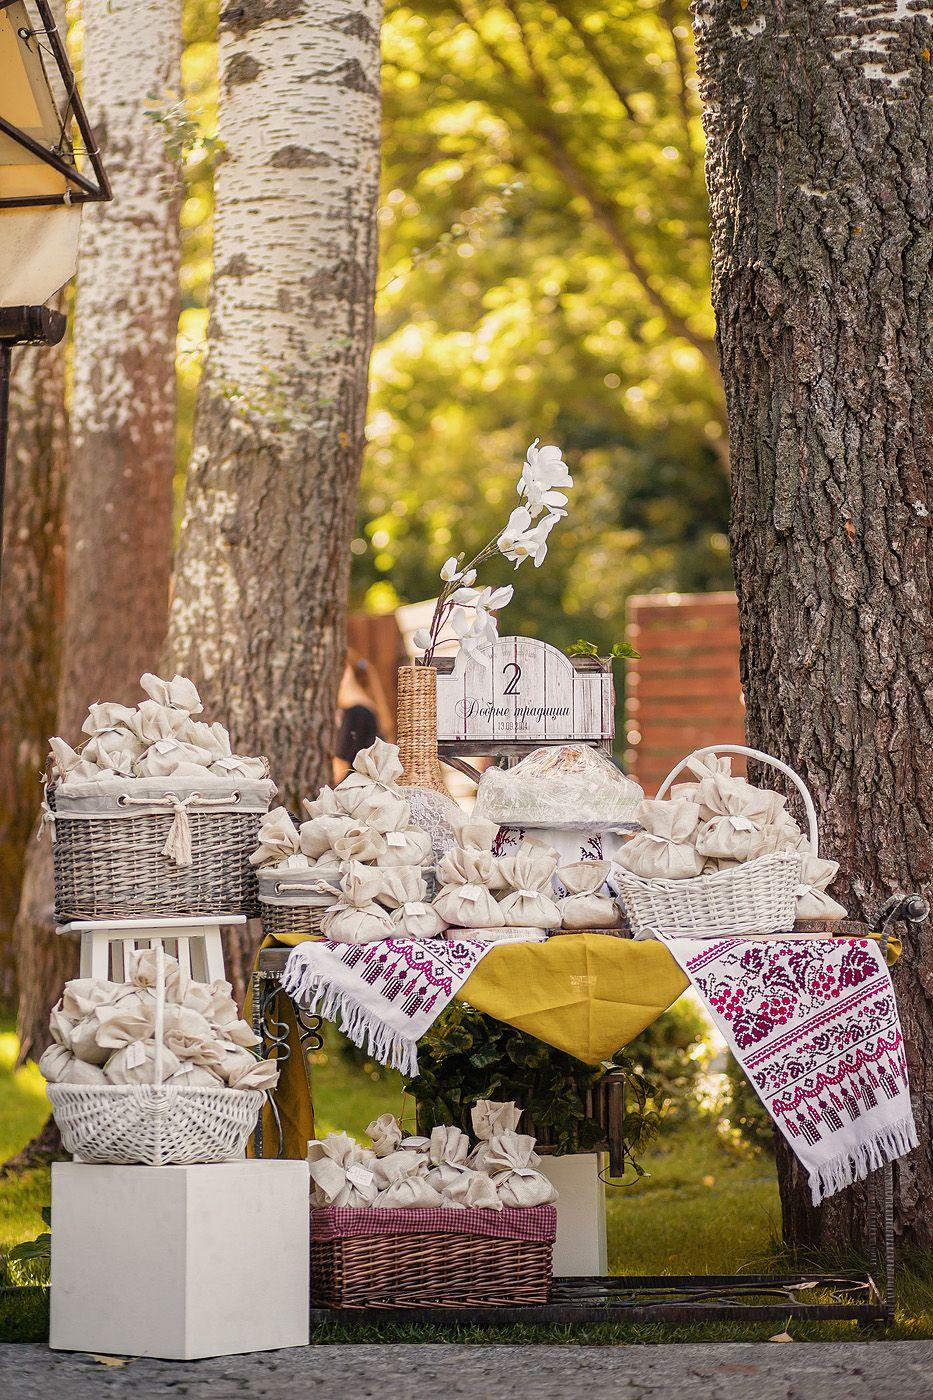 wedding traditions, wedding efreshments, family traditions, national traditions, свадебные традиции, семейные традиции